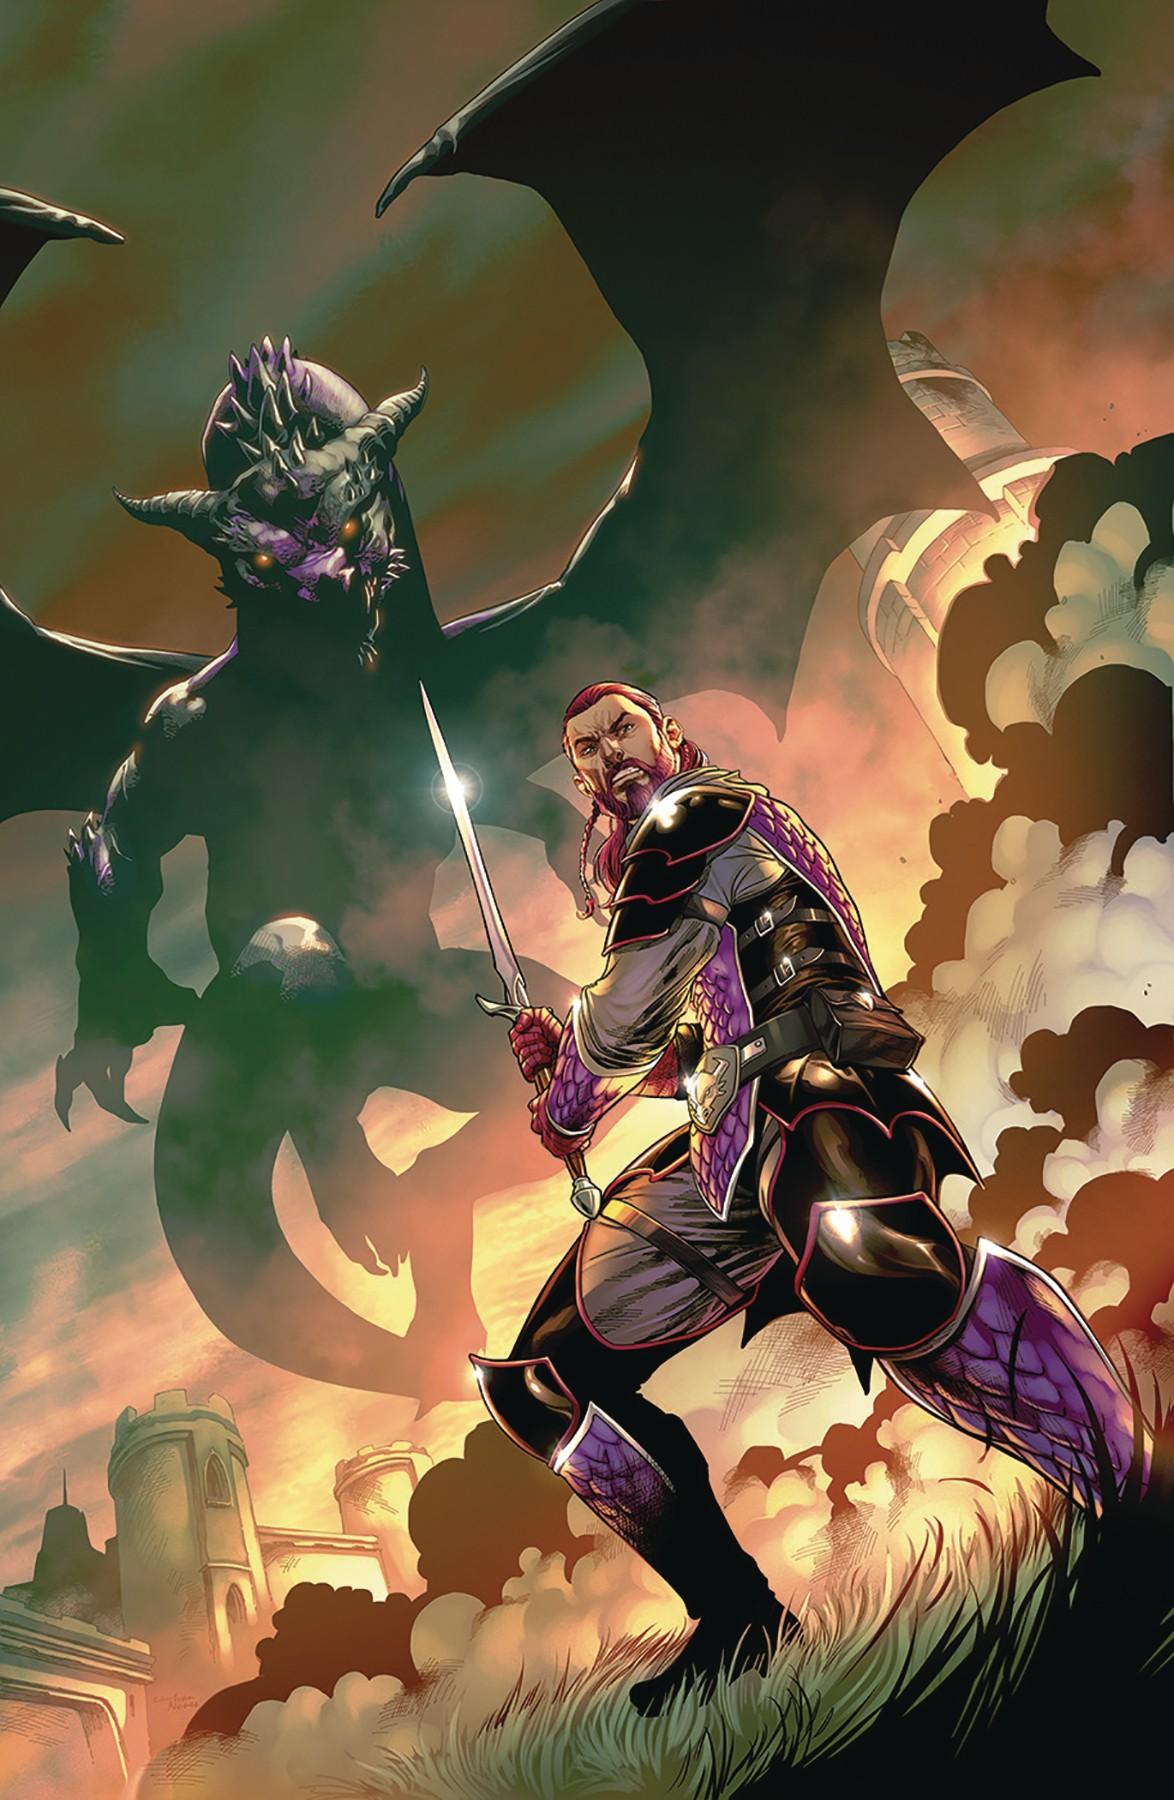 Grimm Tales of Terror Vol 2 V2 #7 ~ Zenescope ~ Briefcase Killer 7C cover